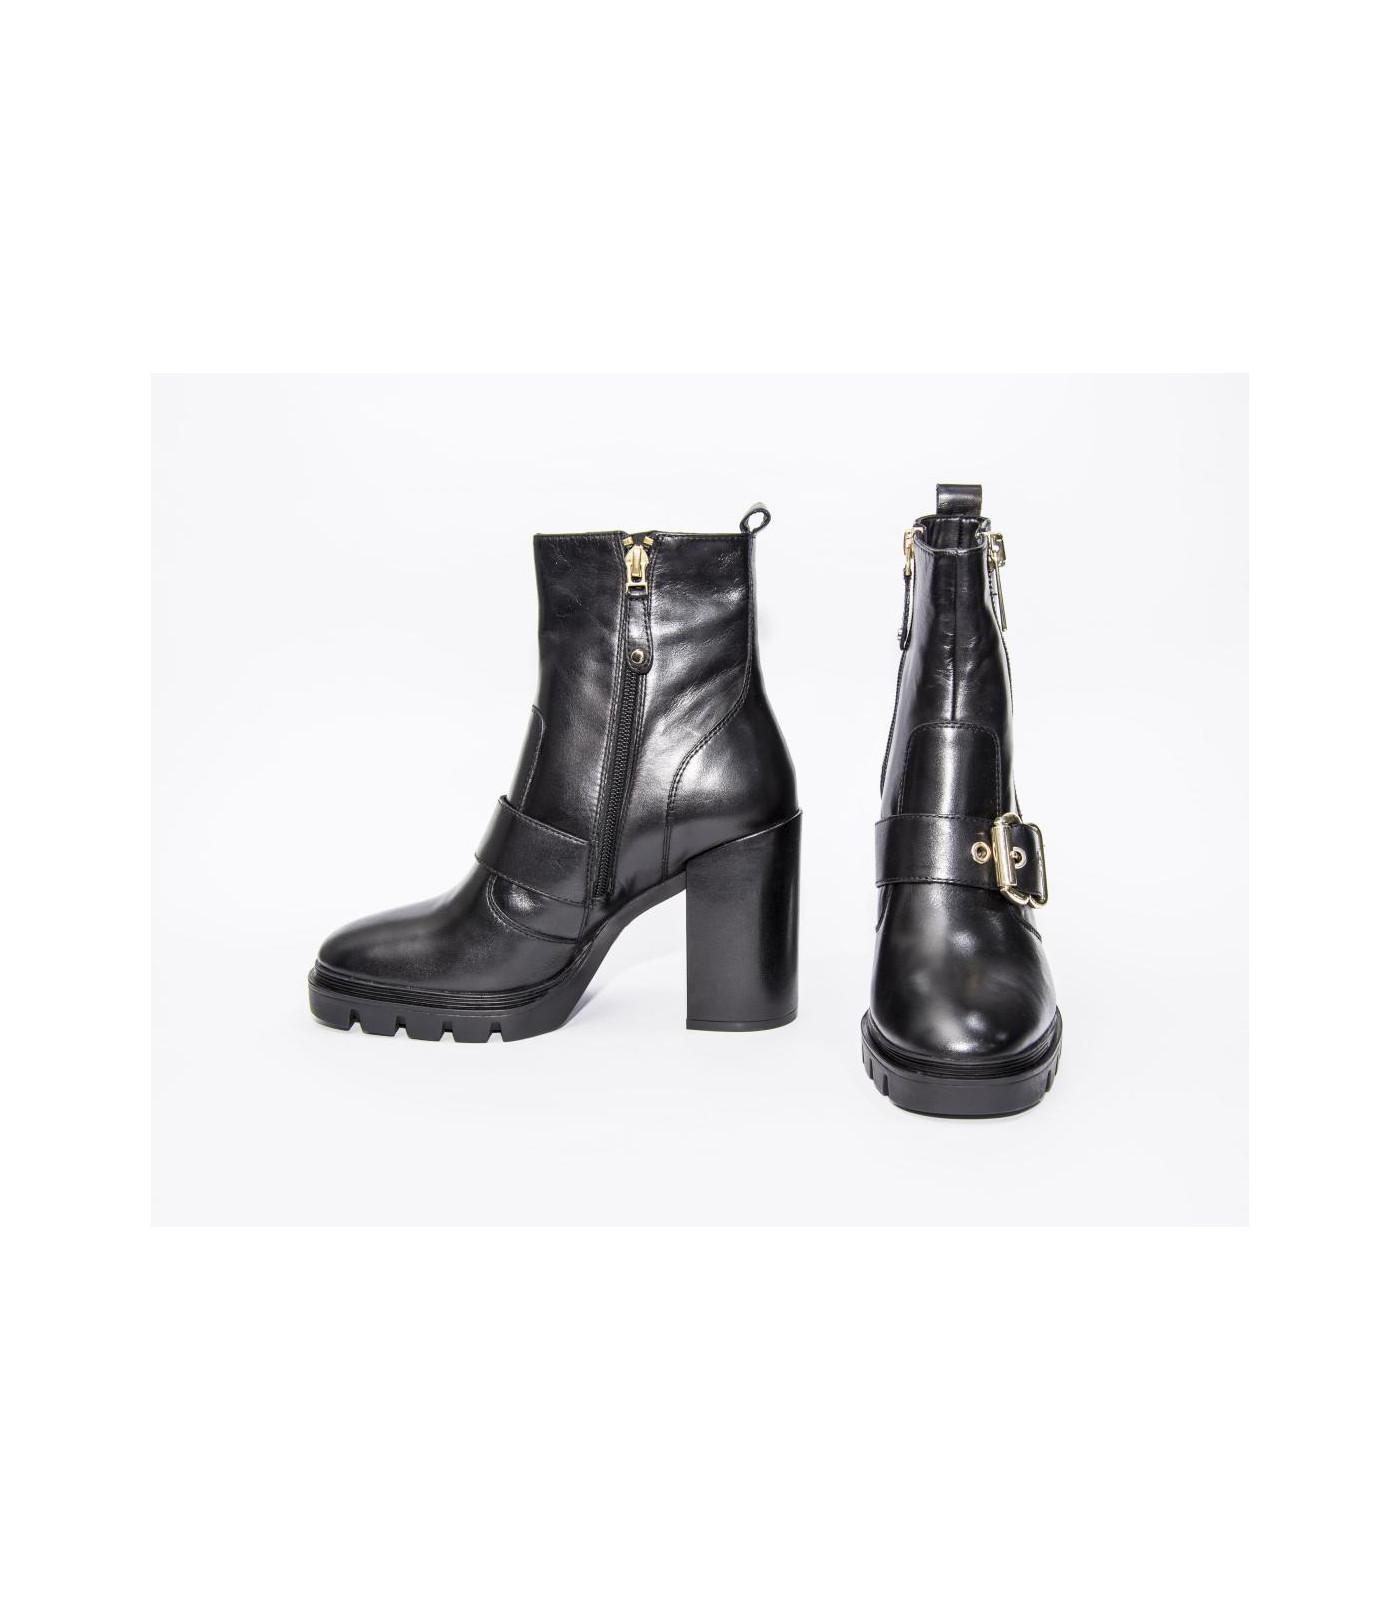 Moda Dorada Lola Calzado Negro Hebilla Con J3tcf1lk Botín Y NkP8XnwO0